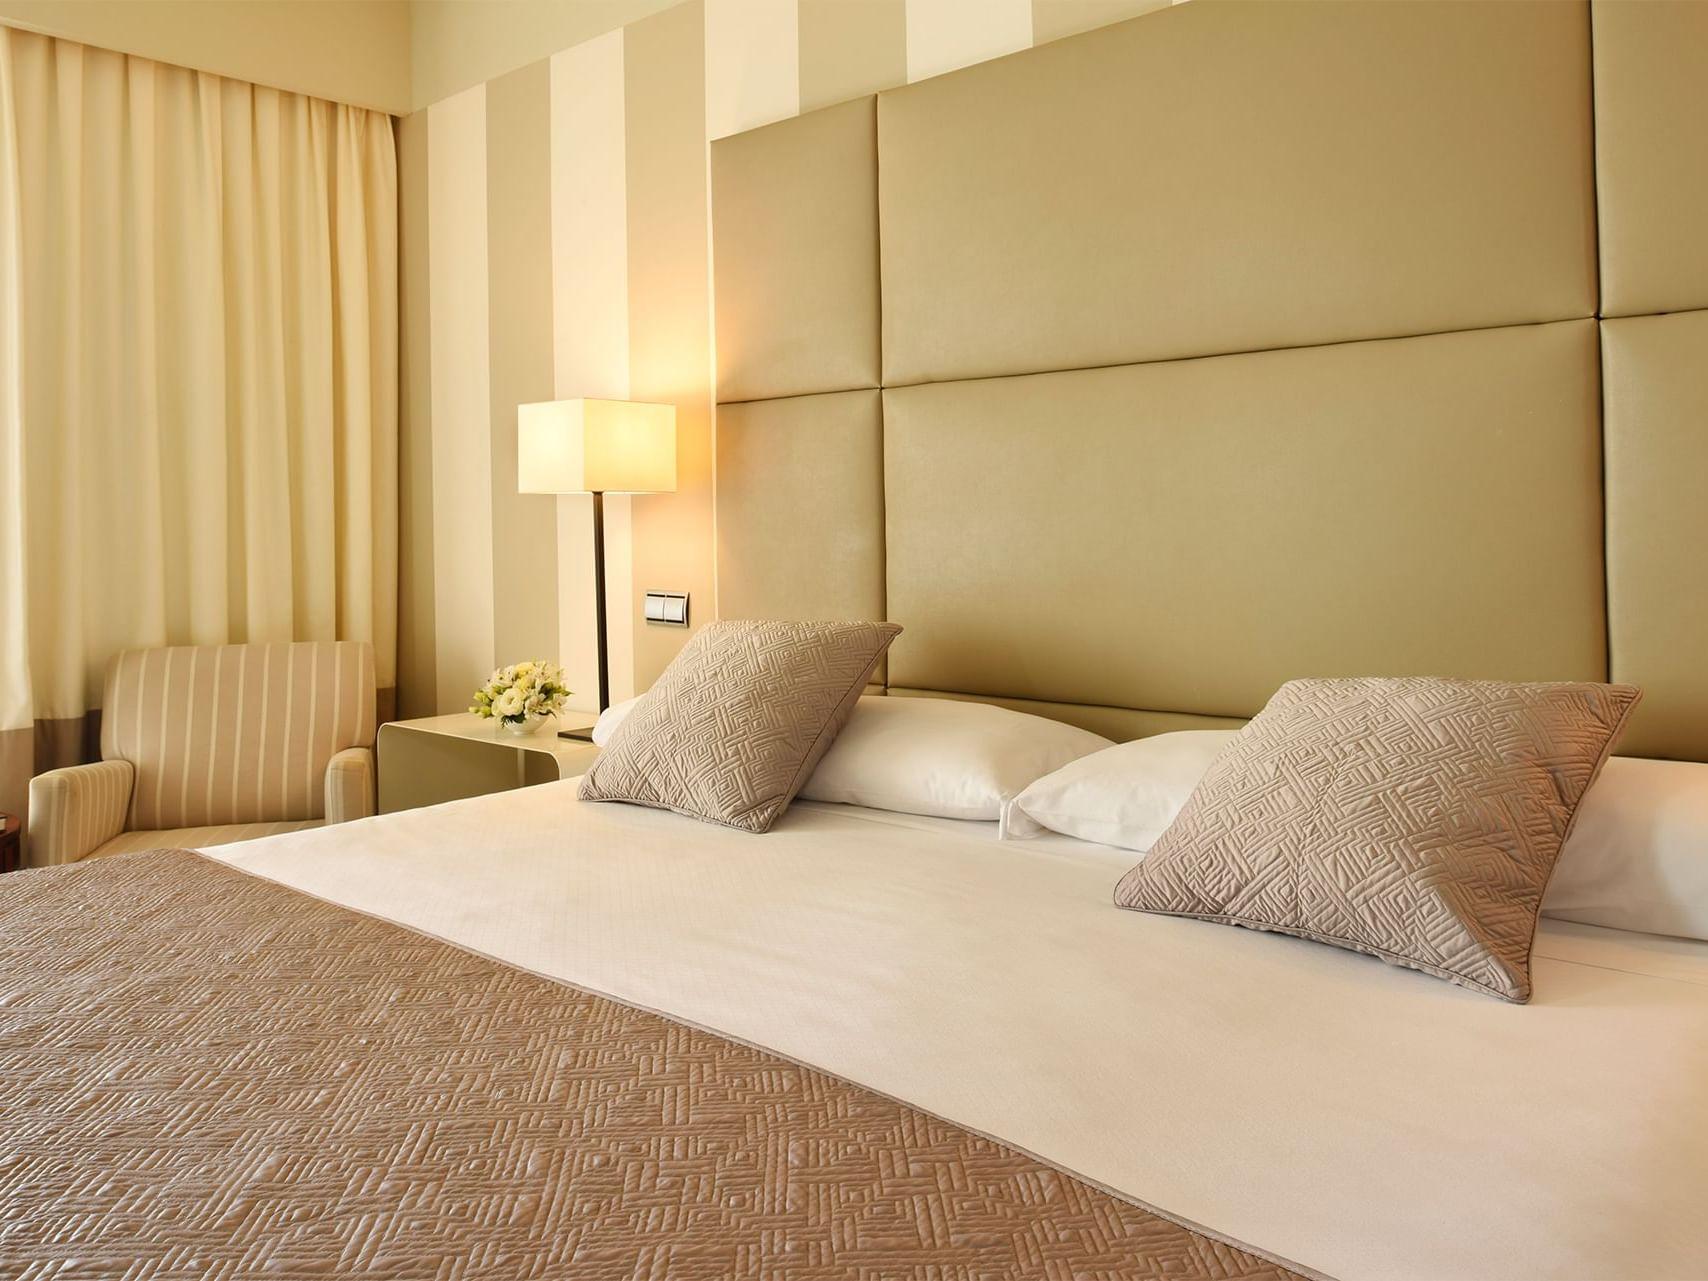 Standard room at Precise Resort El Rompido